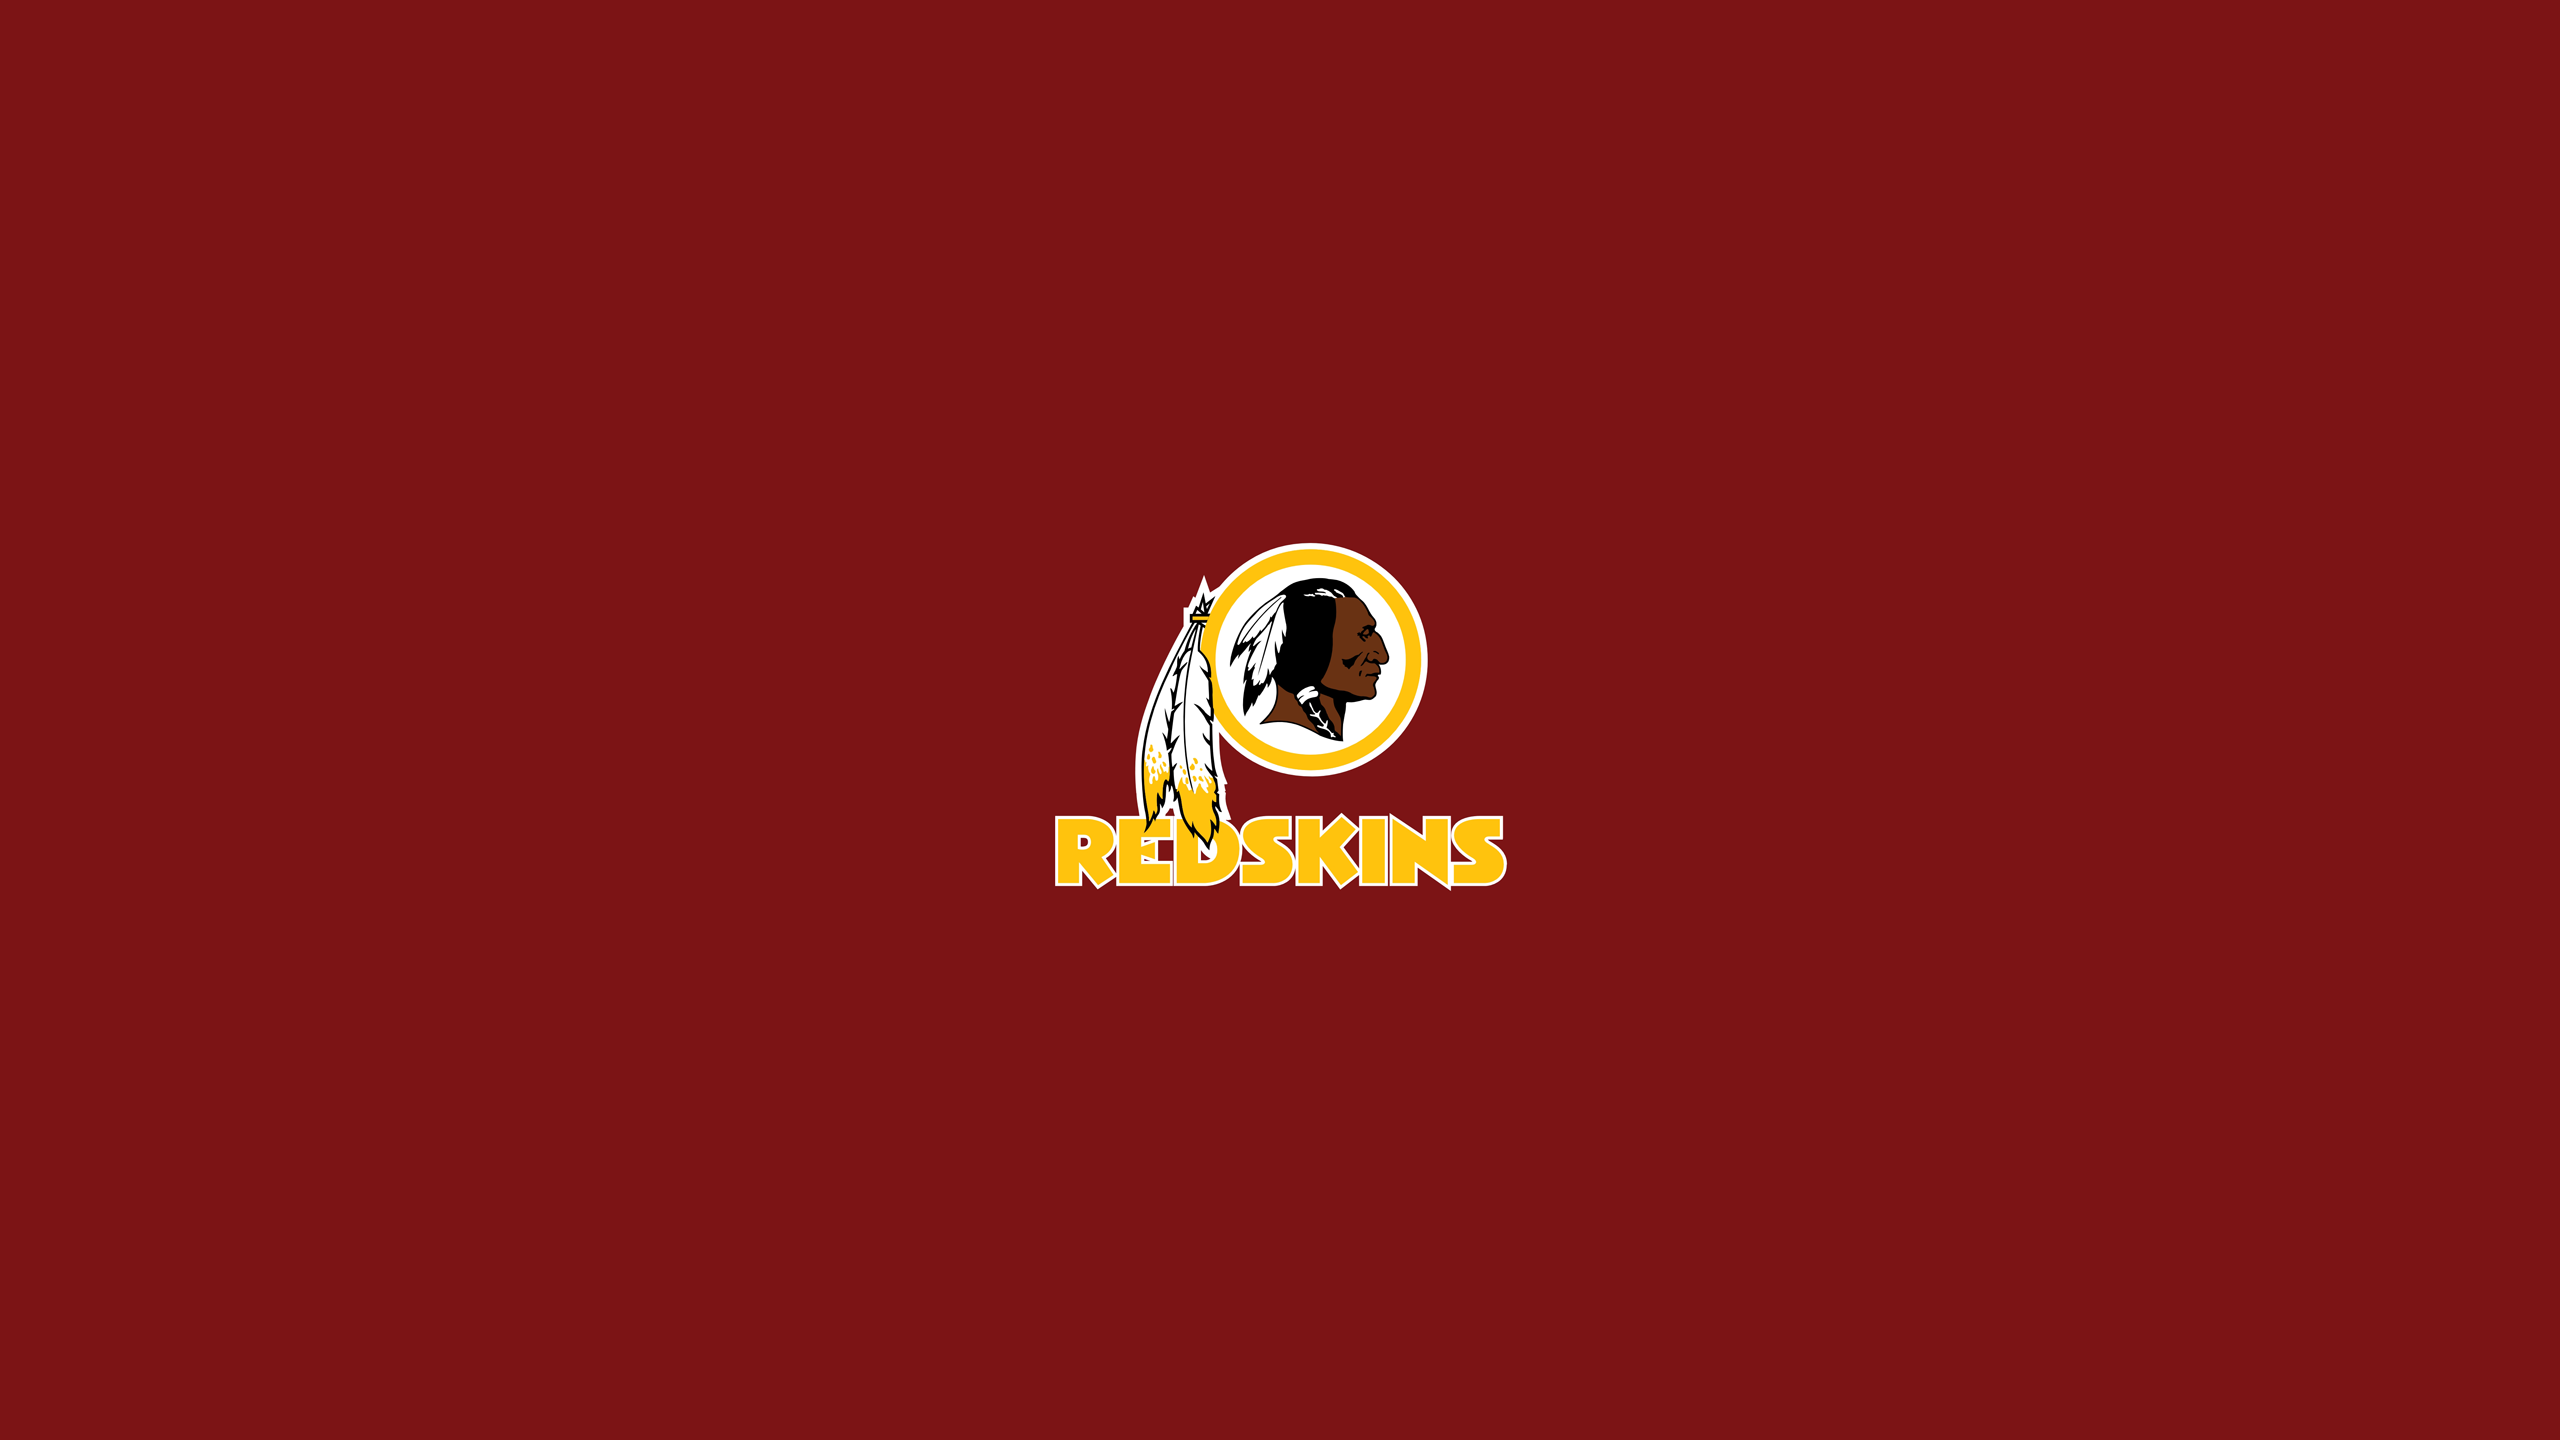 WASHINGTON REDSKINS nfl football hs wallpaper background 2560x1440